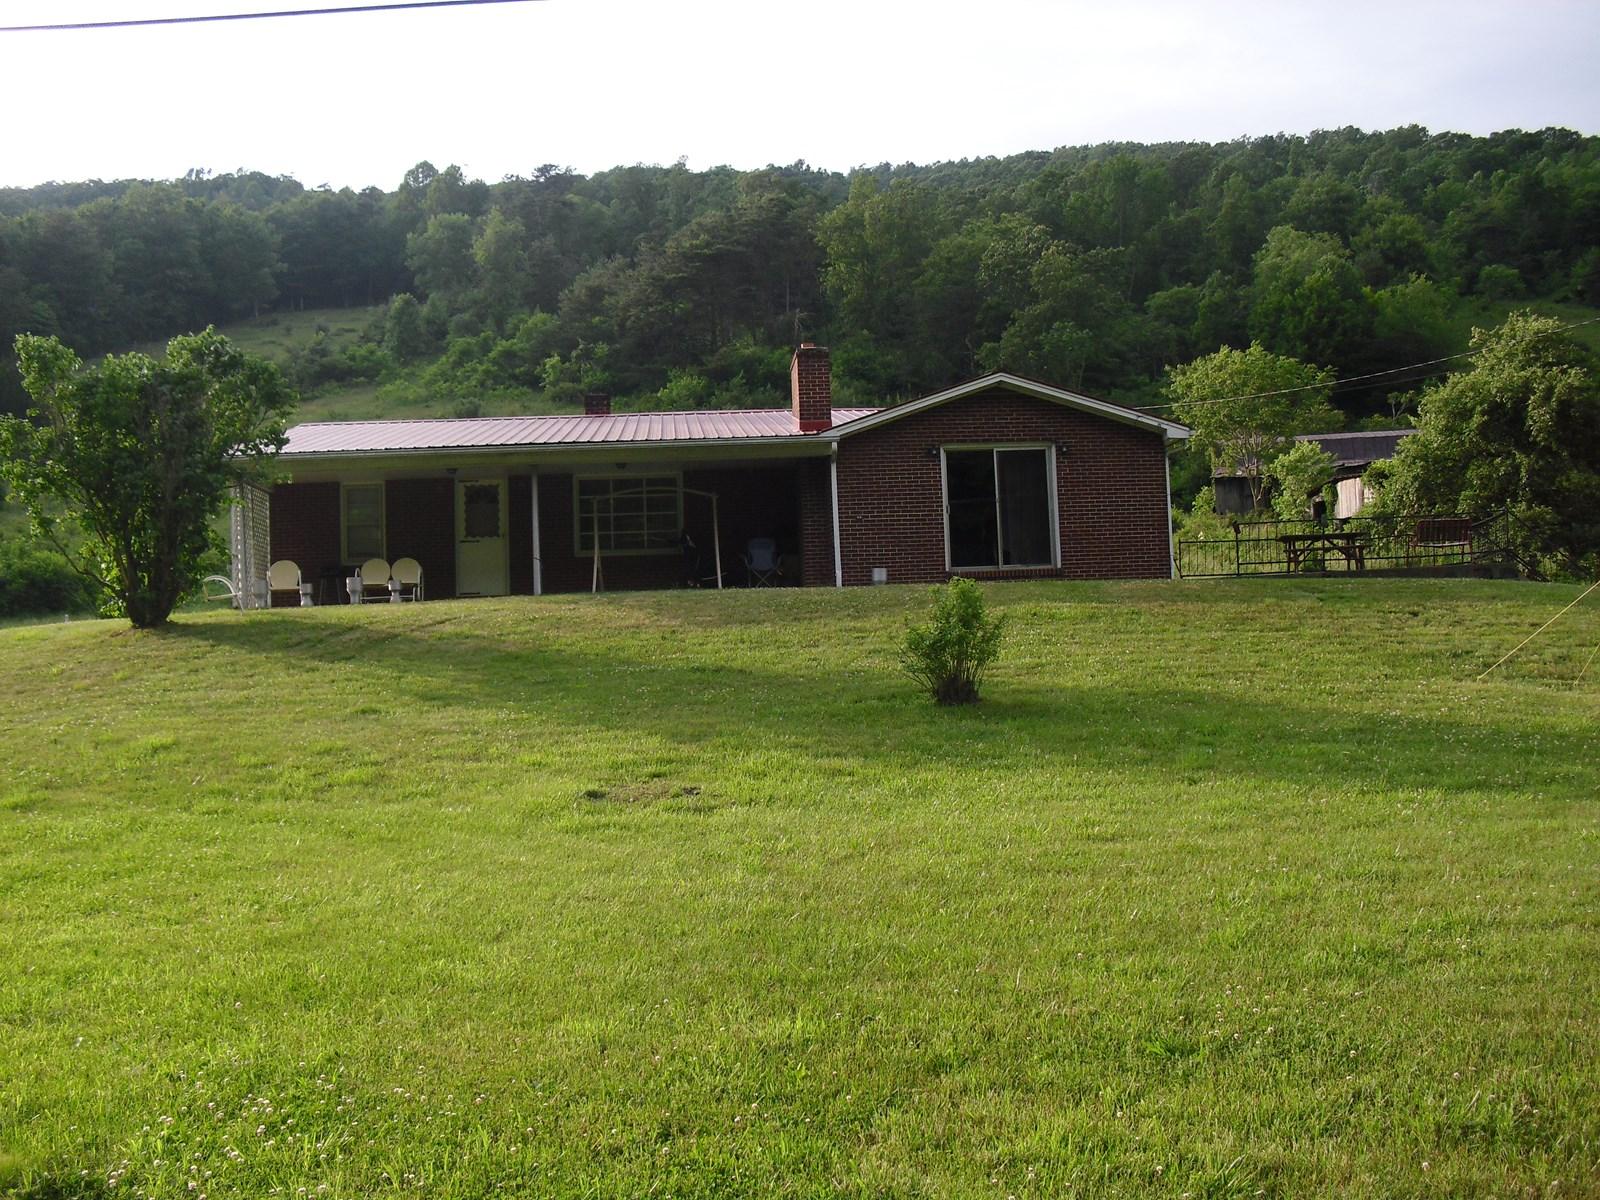 4 Bedroom 2 Bath Brick Ranch on 4 Acres, near Marion, VA!